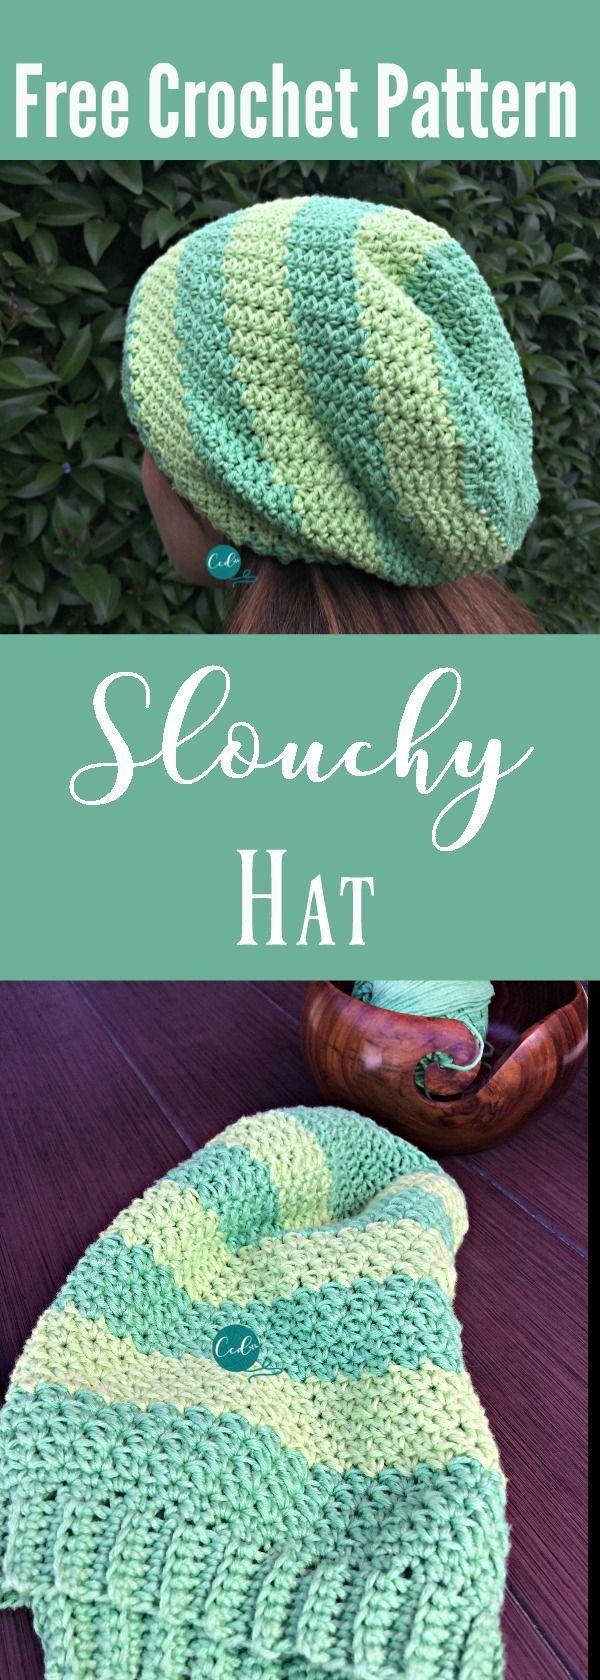 Striped Slouchy Hat Free Crochet Pattern | Slouch hats, Slouchy hat ...